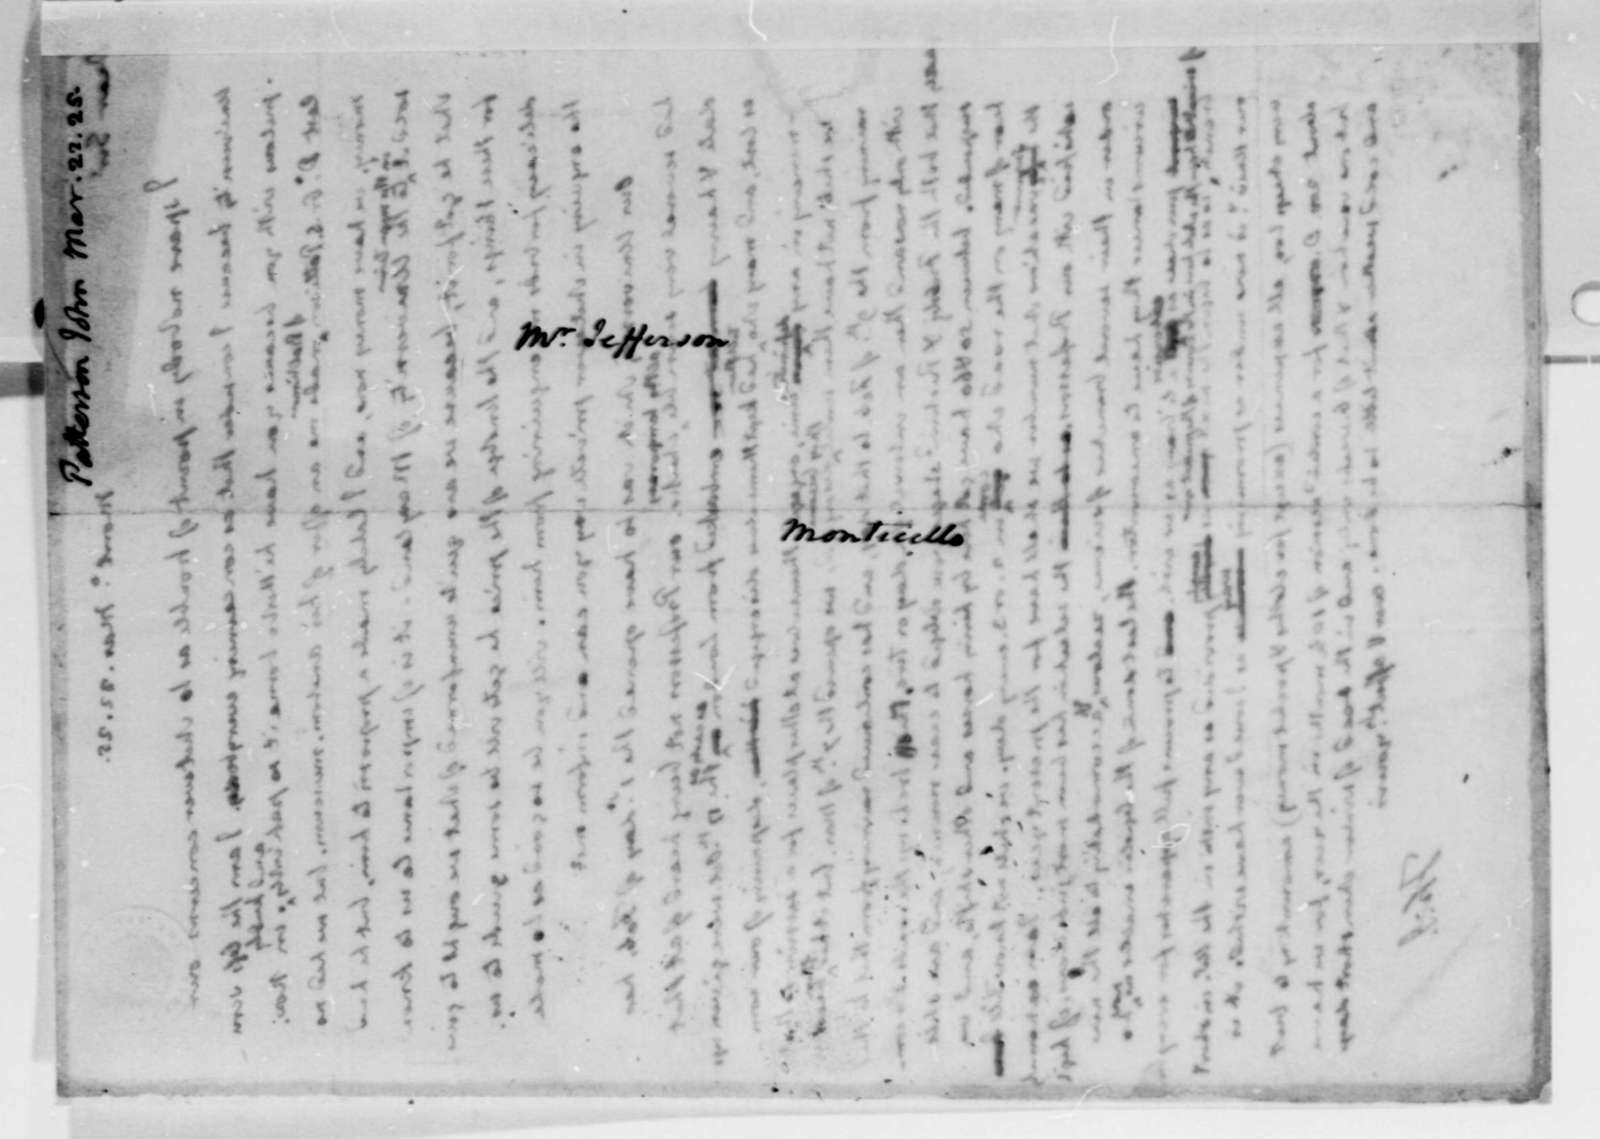 Thomas Jefferson to James Patterson, March 22, 1825